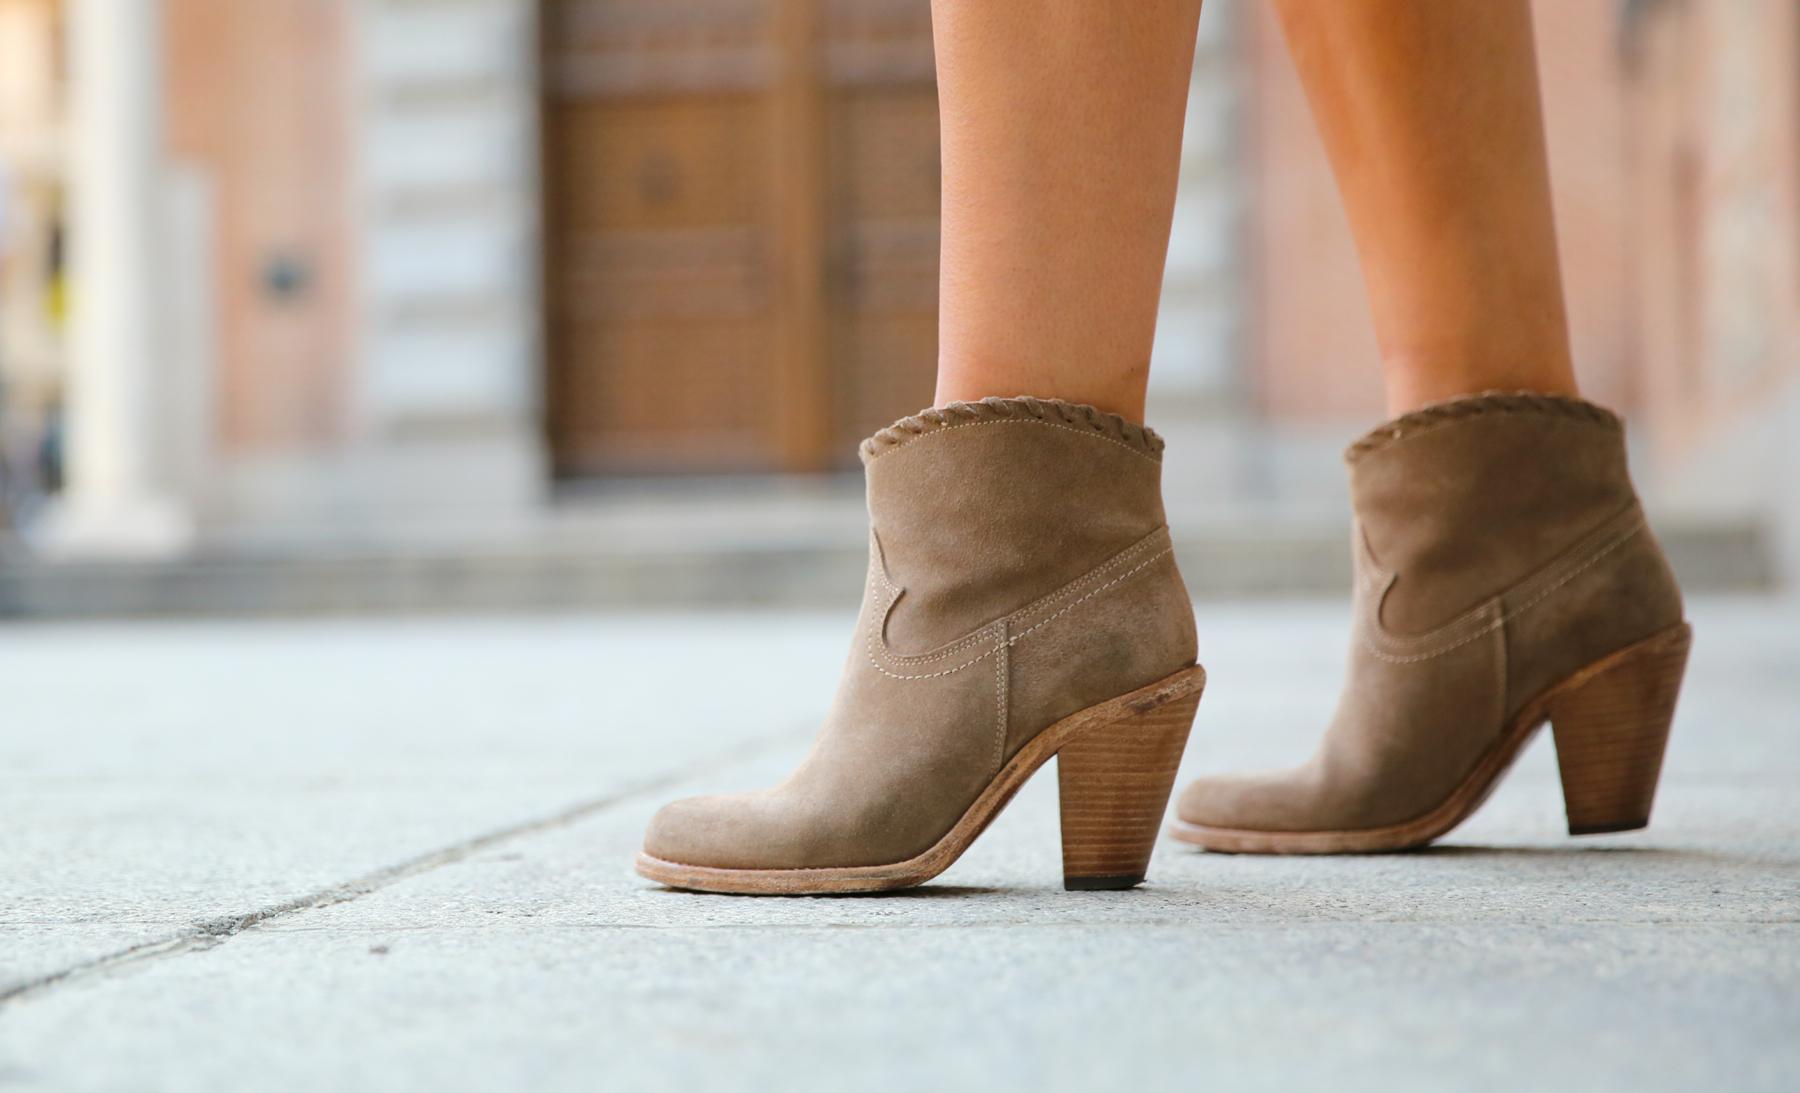 trendy_taste-look-outfit-street_style-denim-blog-blogger-fashion_spain-moda_españa-botines_camperos-it_shoes-cowboy_booties-skirt-falda-bolso_flecos-fringes_bag-camisa_vaquera-denim_shirt-2